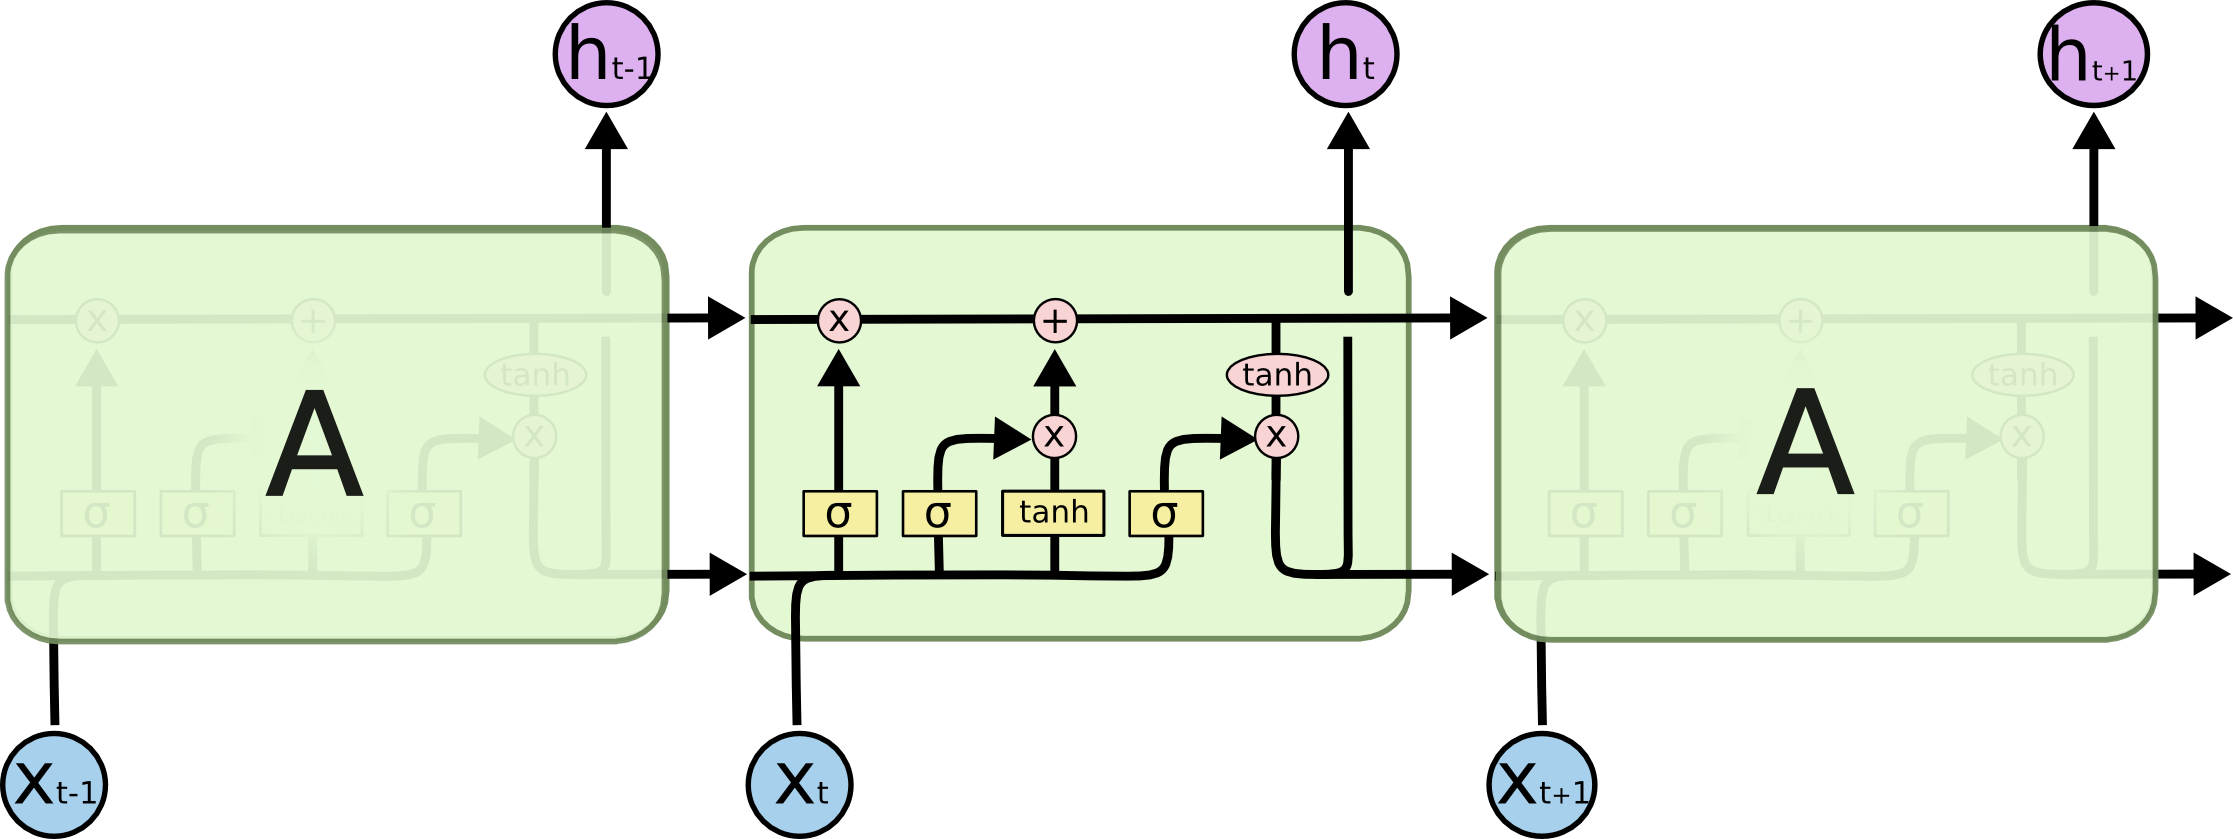 LSTM网络交互层